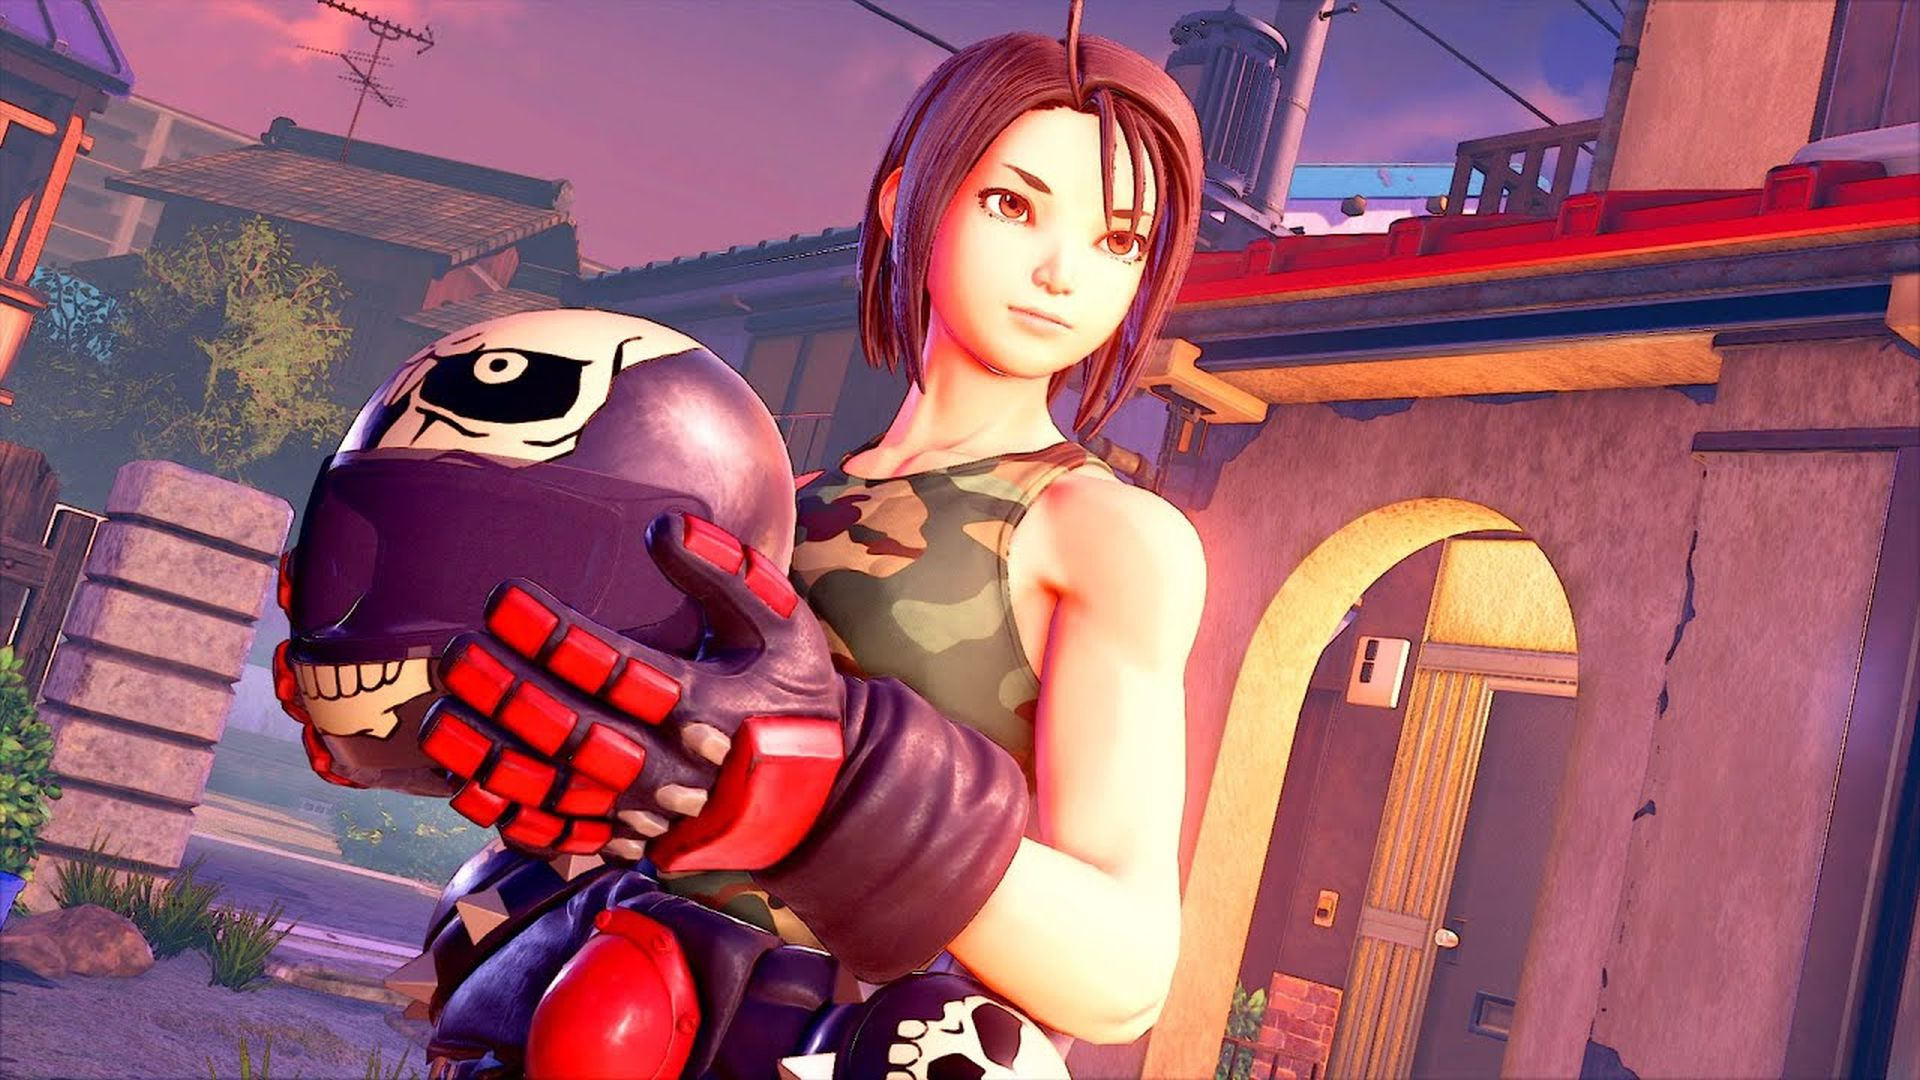 Street fighter 5 akira